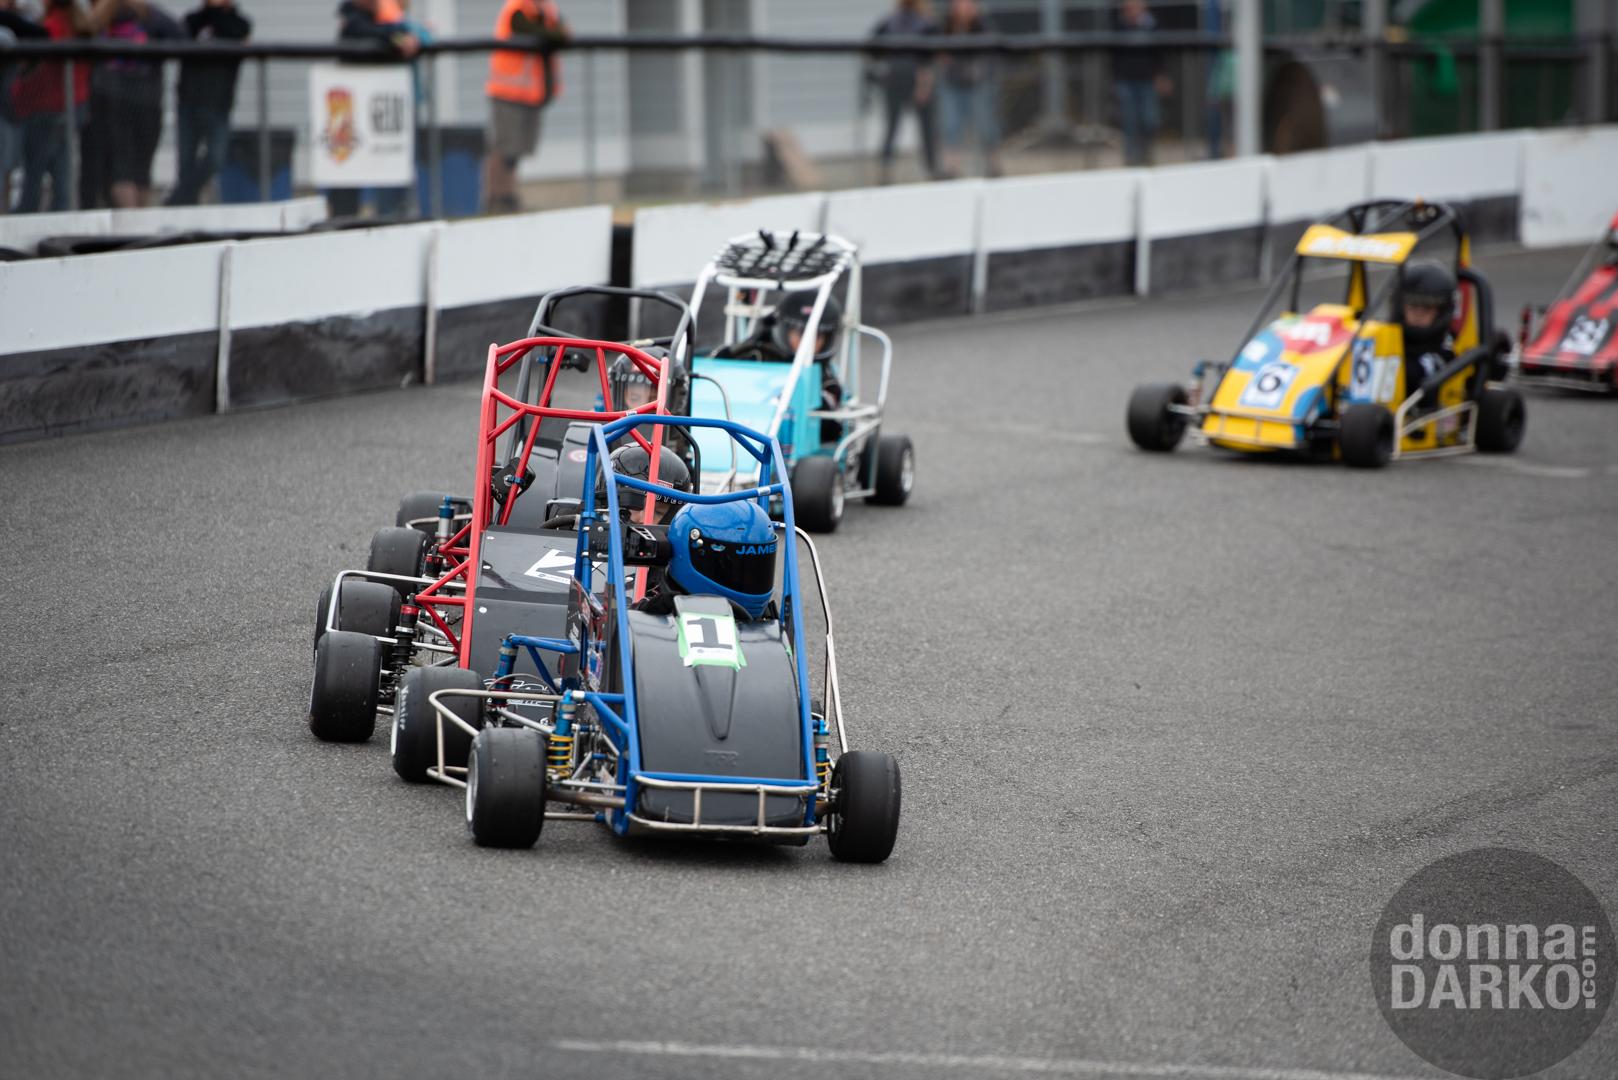 QWMA (Racing) 8-11-2019 DSC_5948.jpg